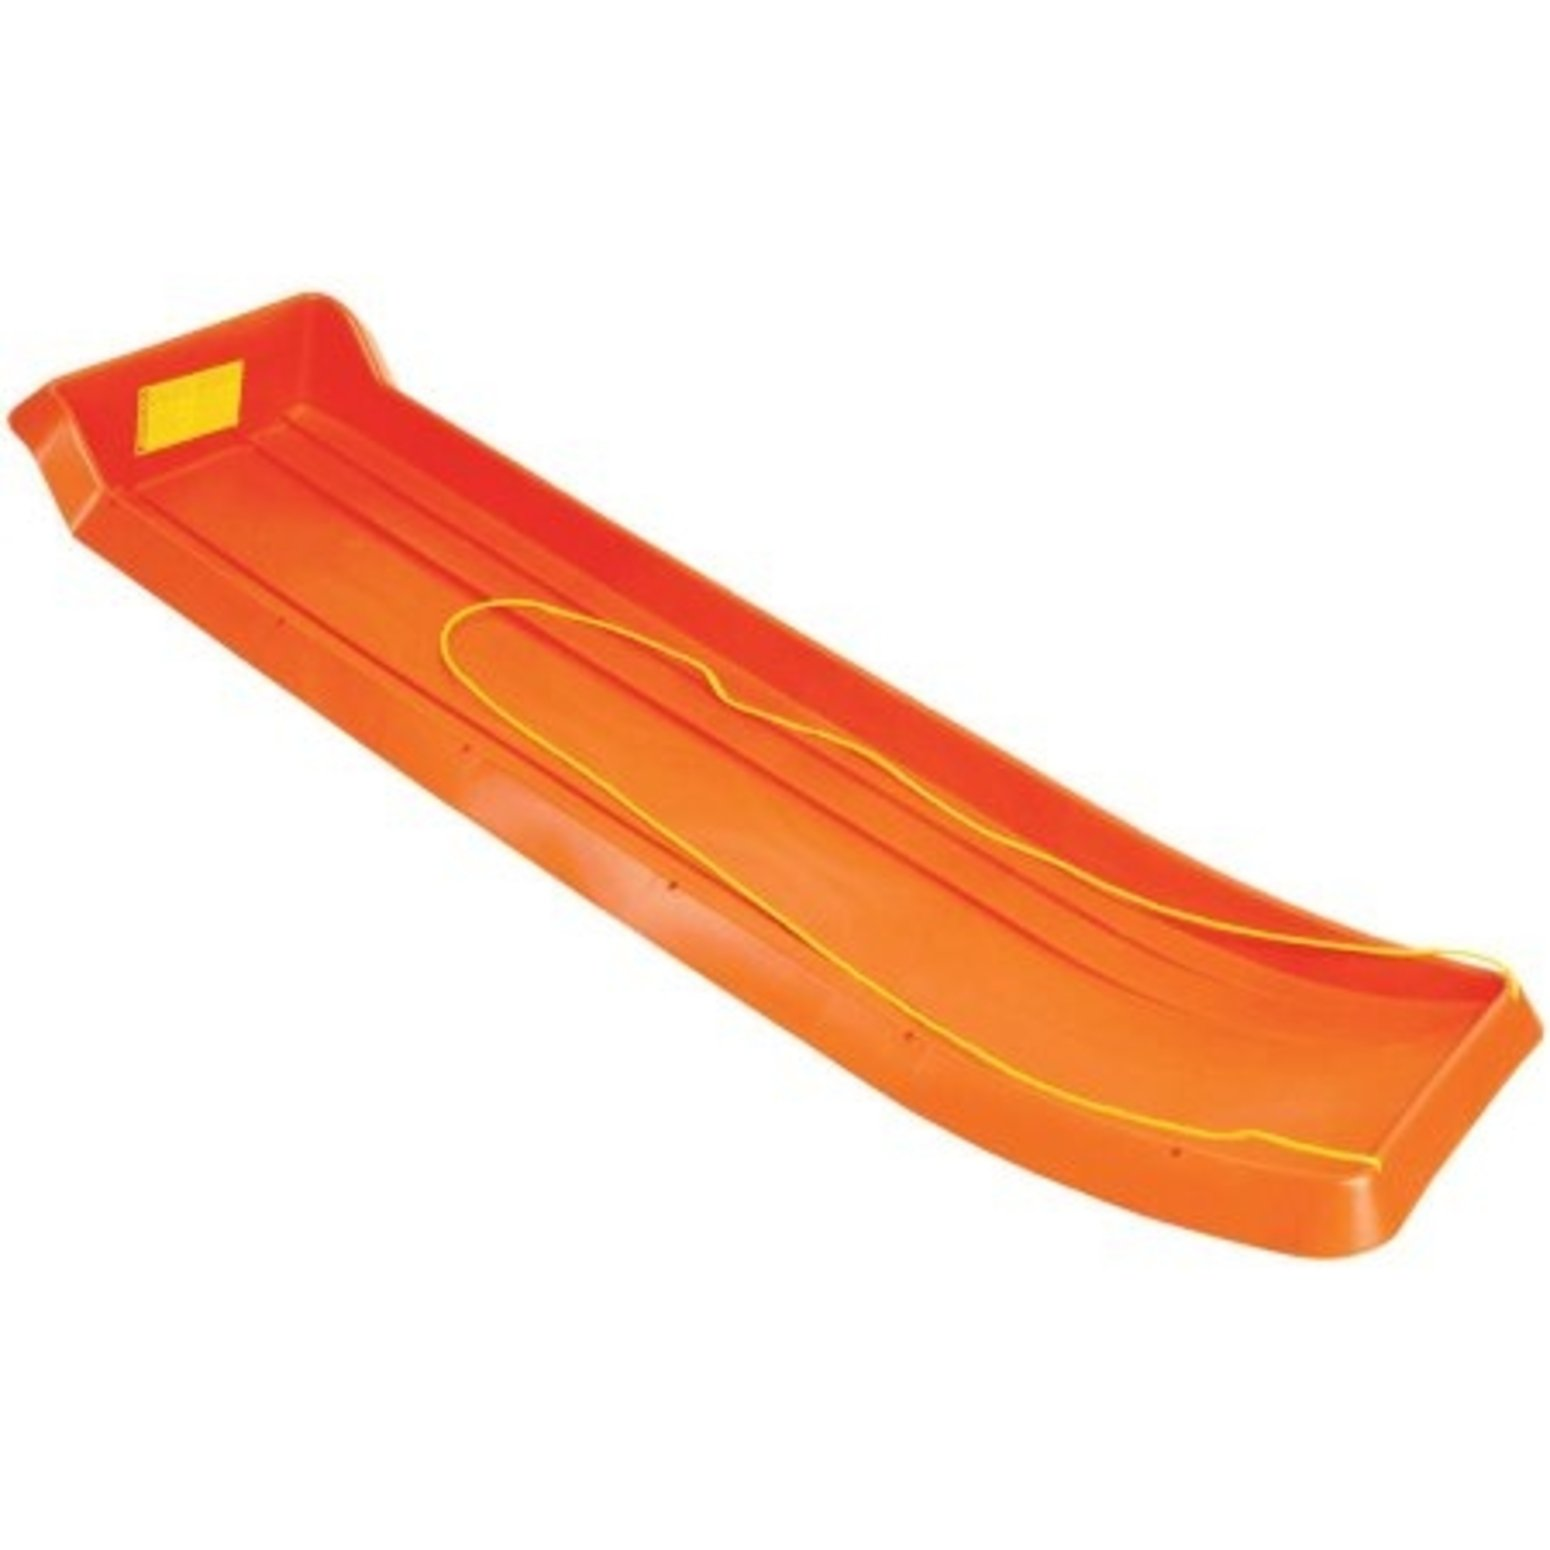 Emsco Group 2916 66'' Family Fun Toboggan Sled with Towrope, Orange